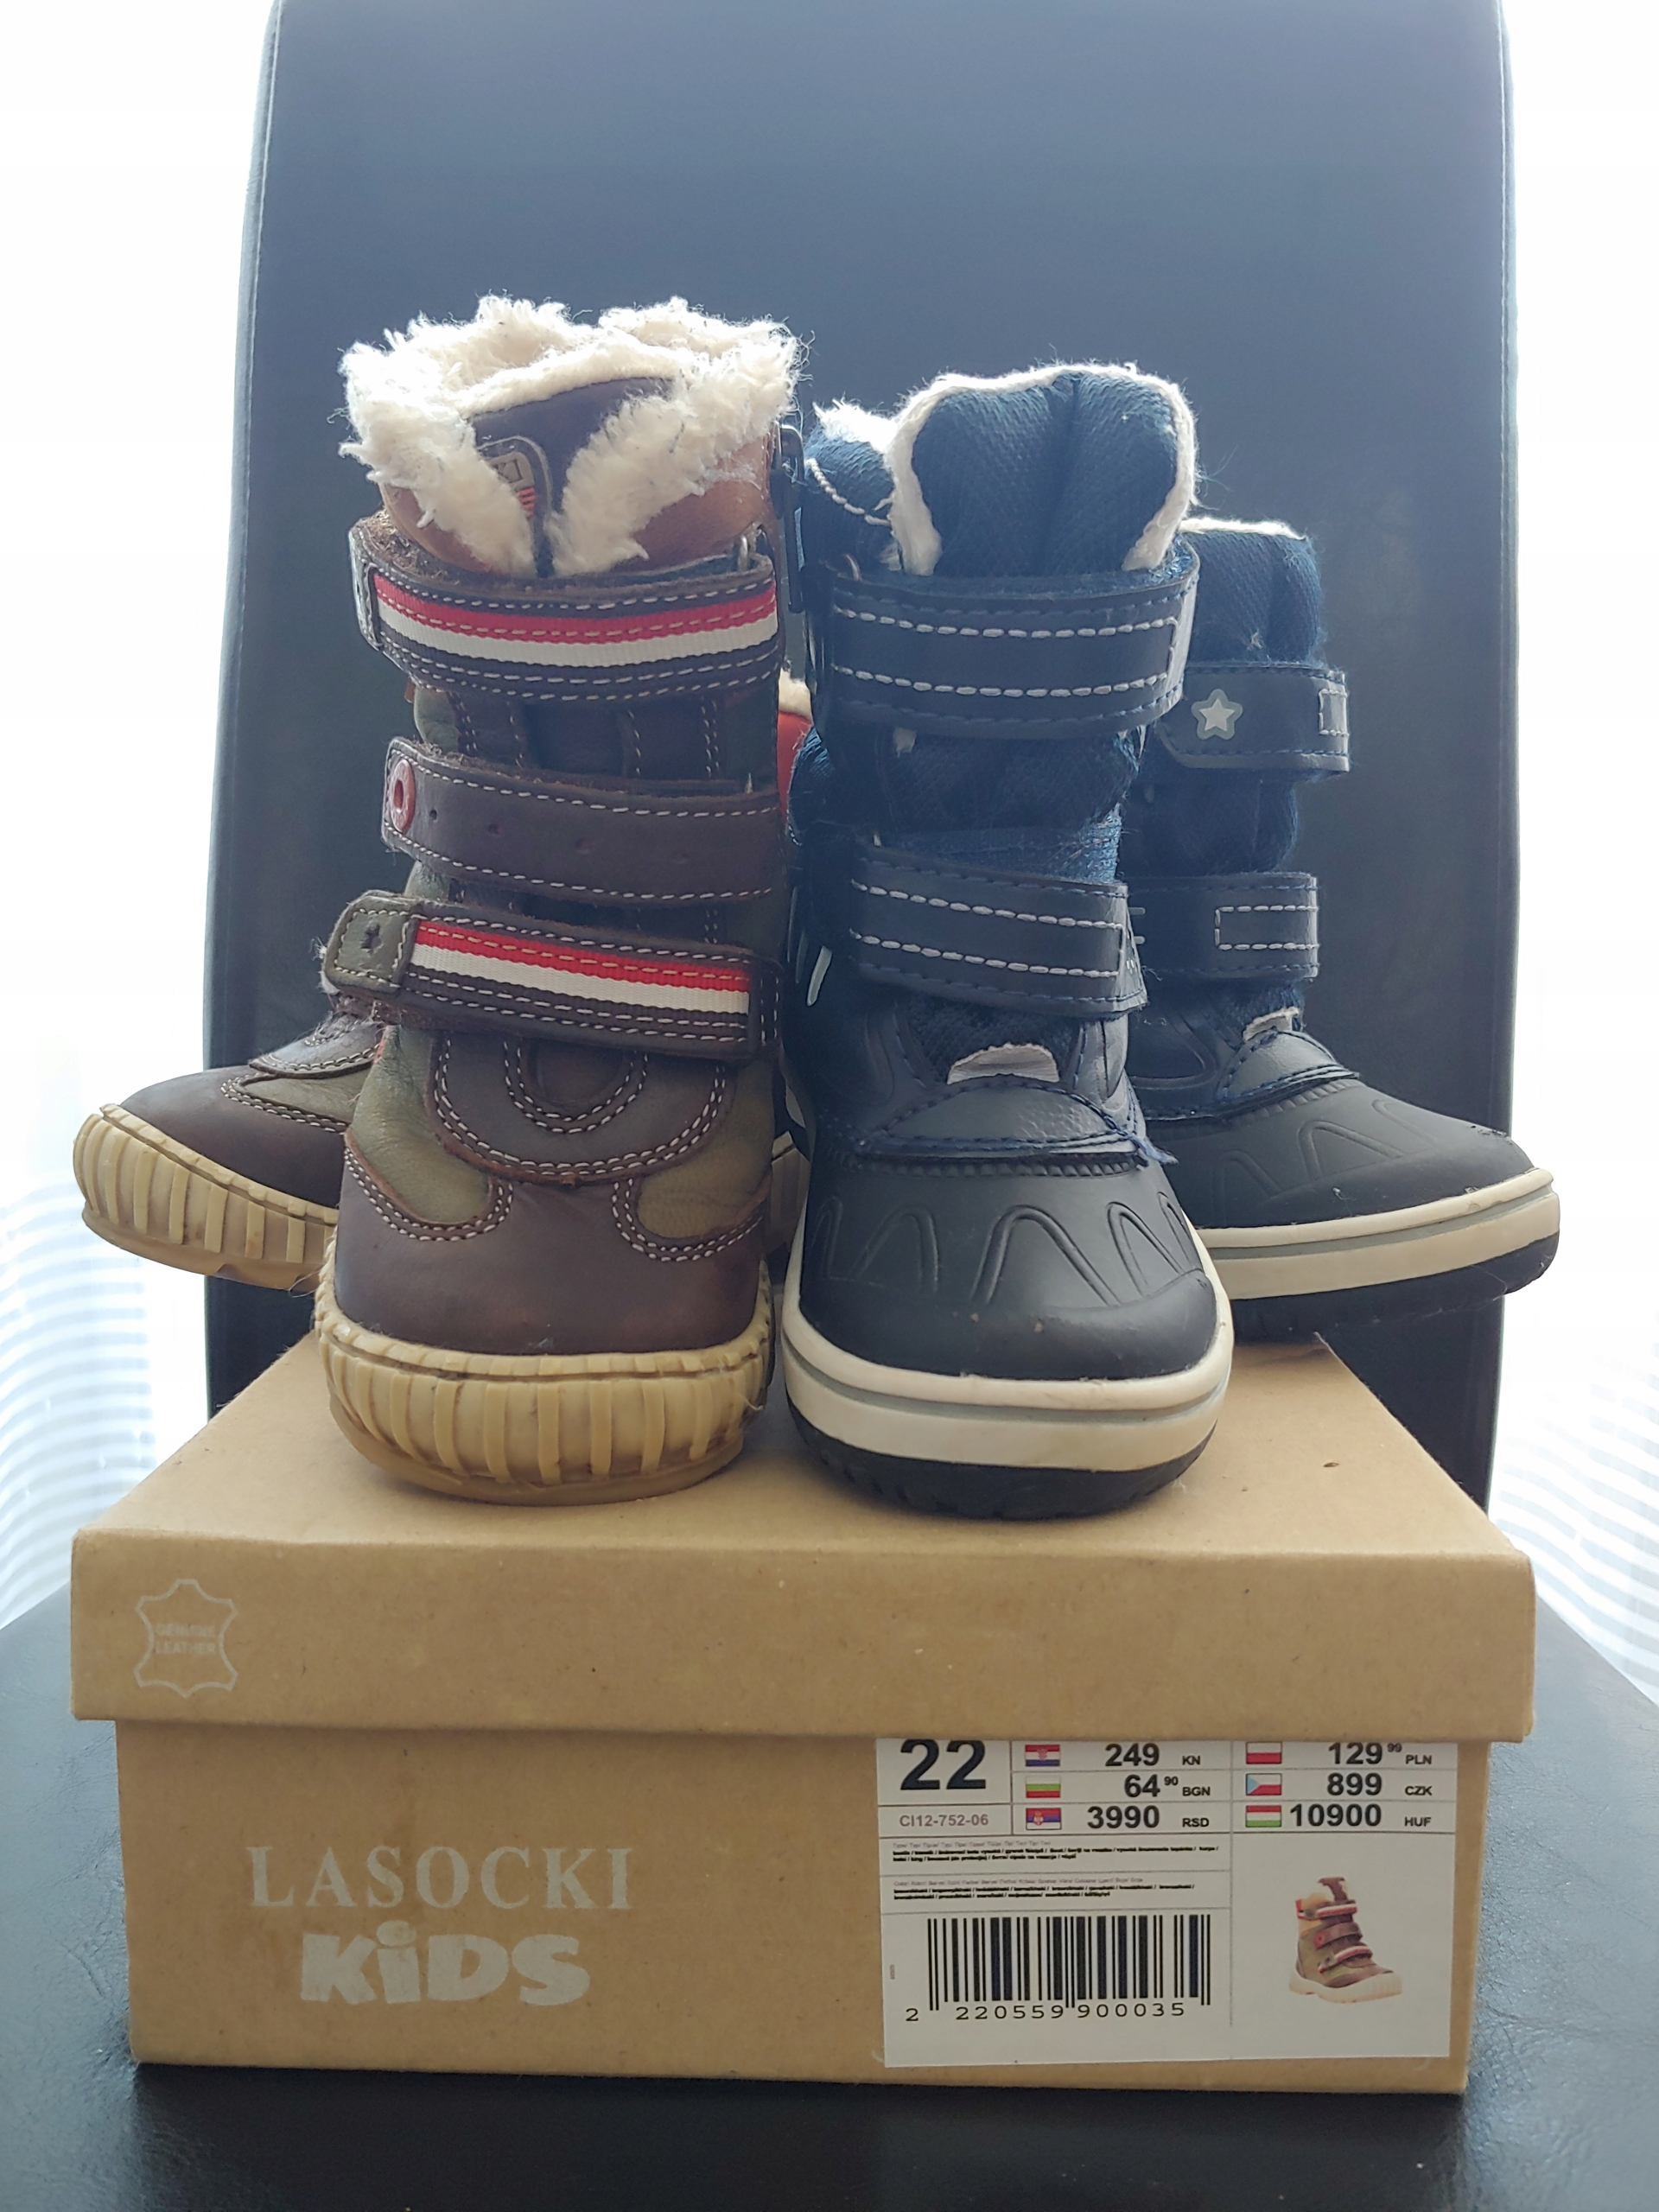 359fb96141e51 Kozaczki Lasocki Kids skóra + Śniegowce Lidl, 22 - 7658335604 ...